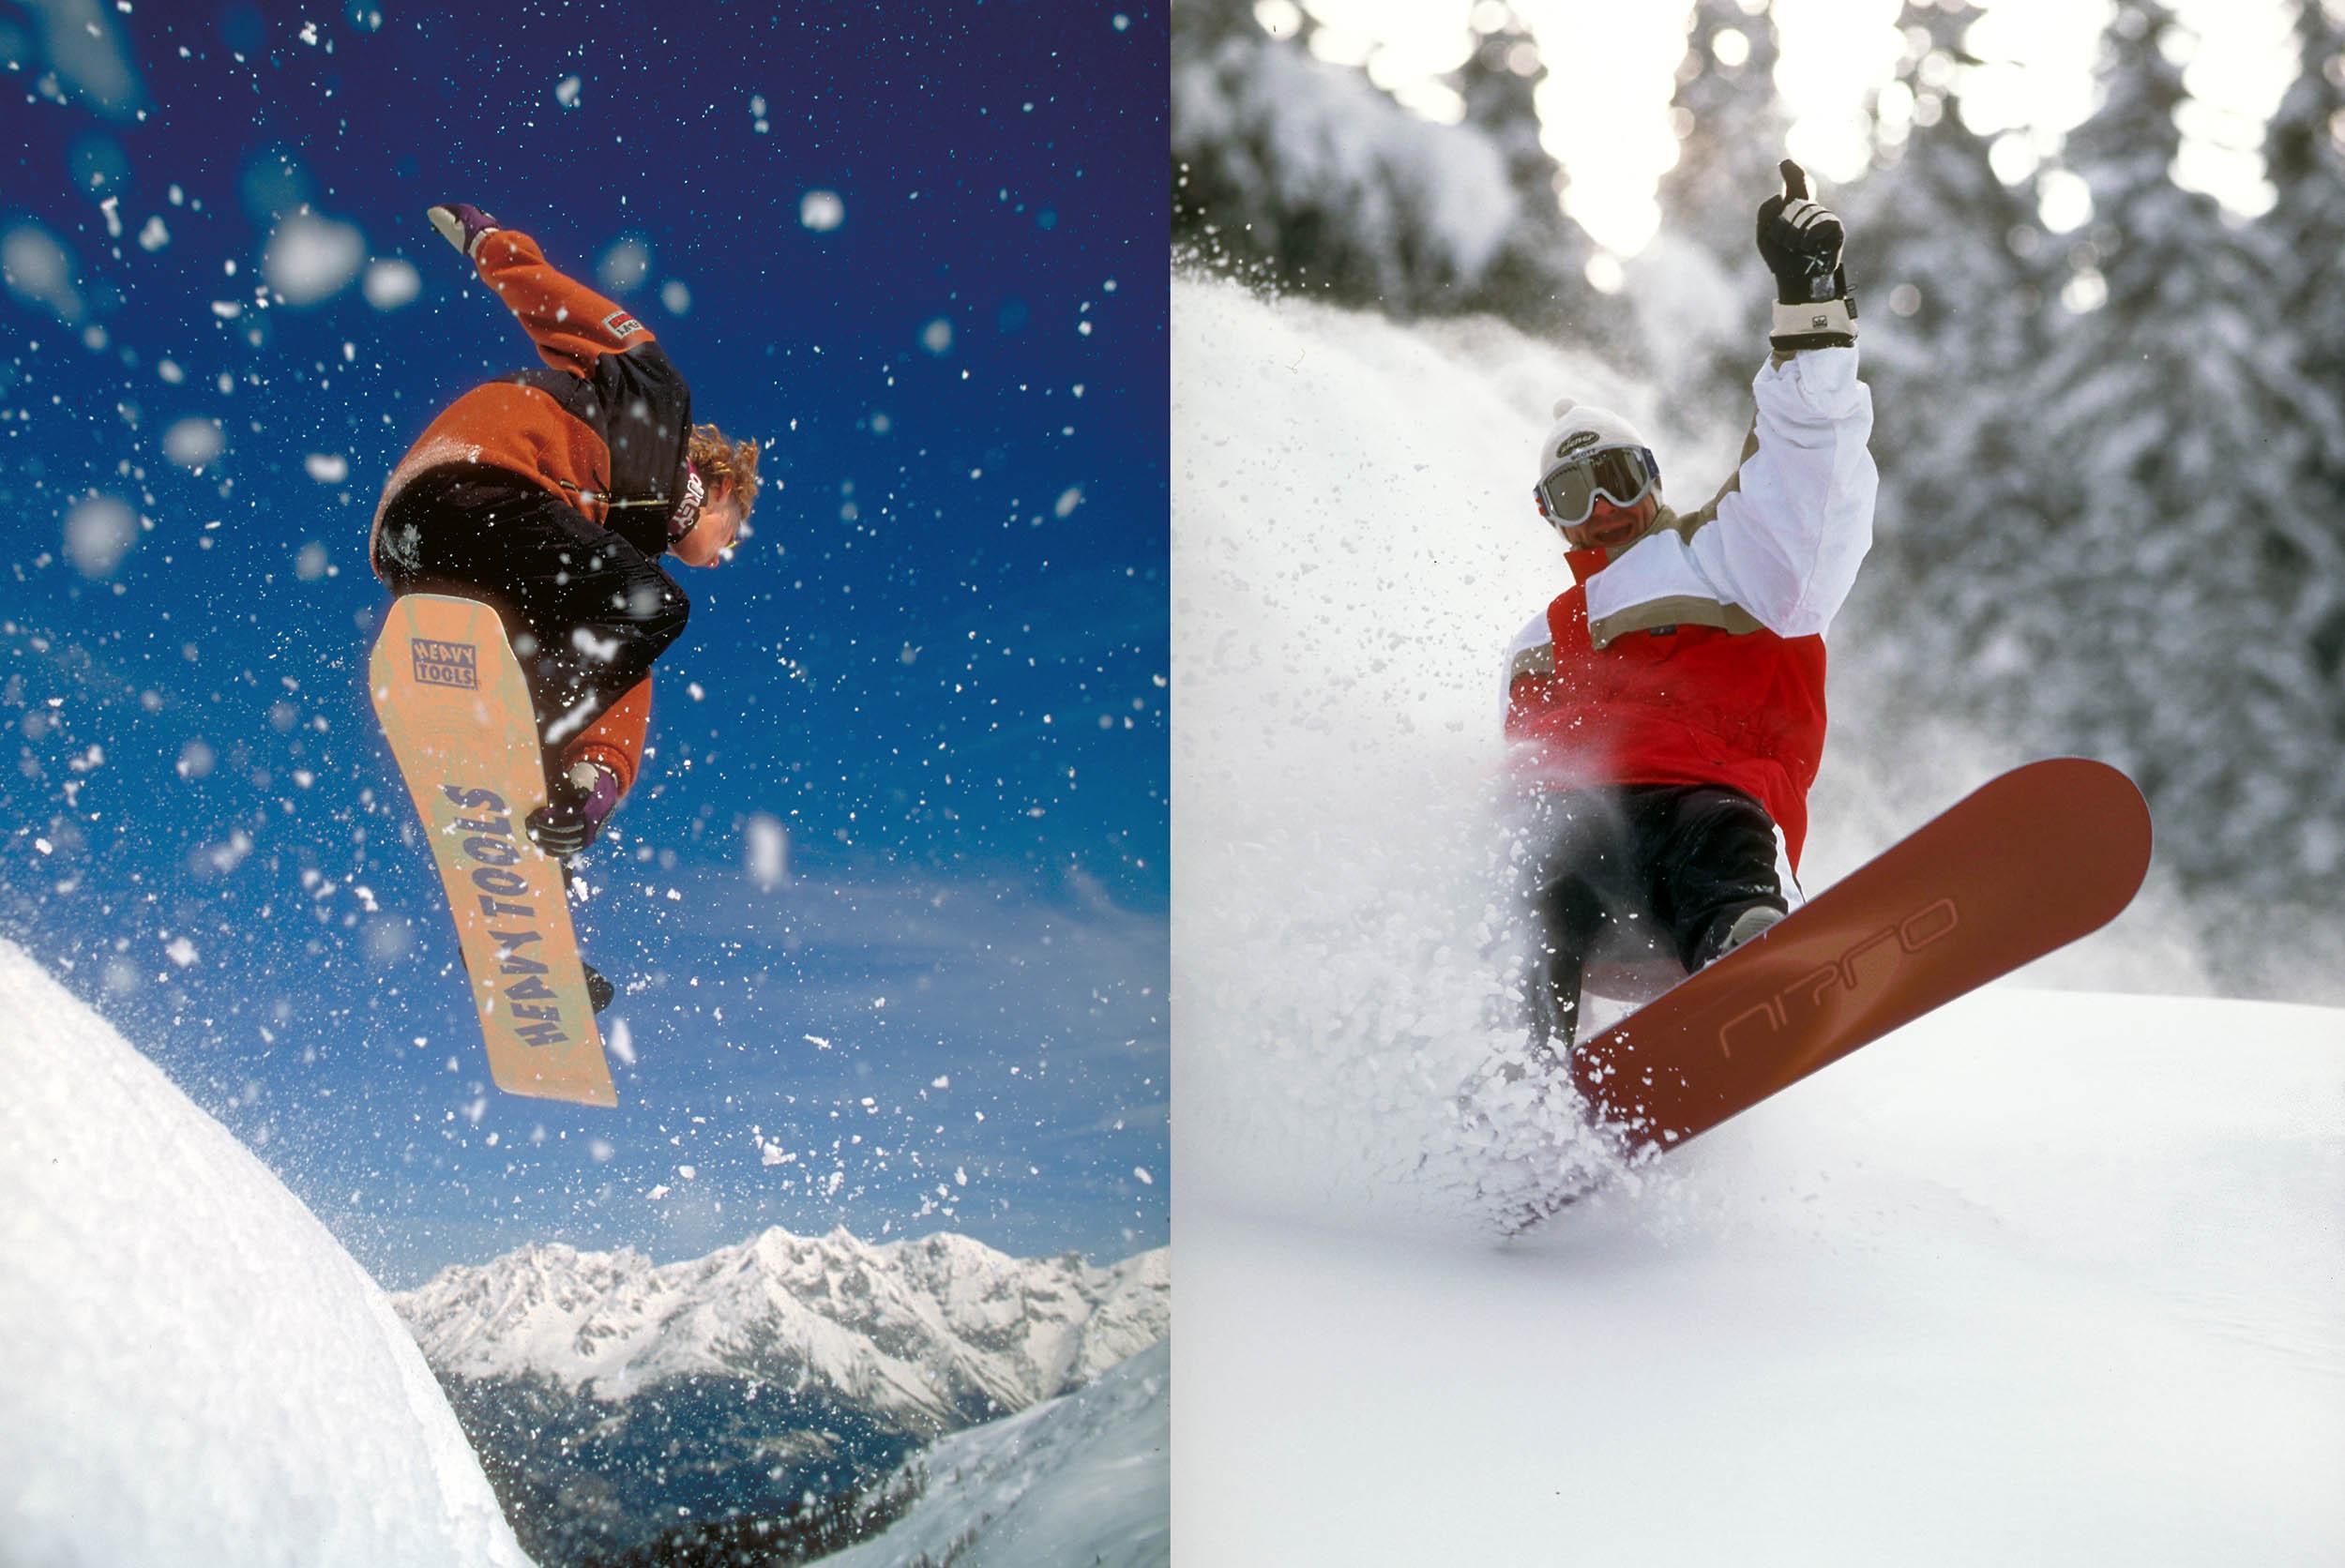 Snow_001 Heavy Tools Snowboard bb_plus_Gerry_COMBI_shp2500px_JPGQU7_454KB.jpg